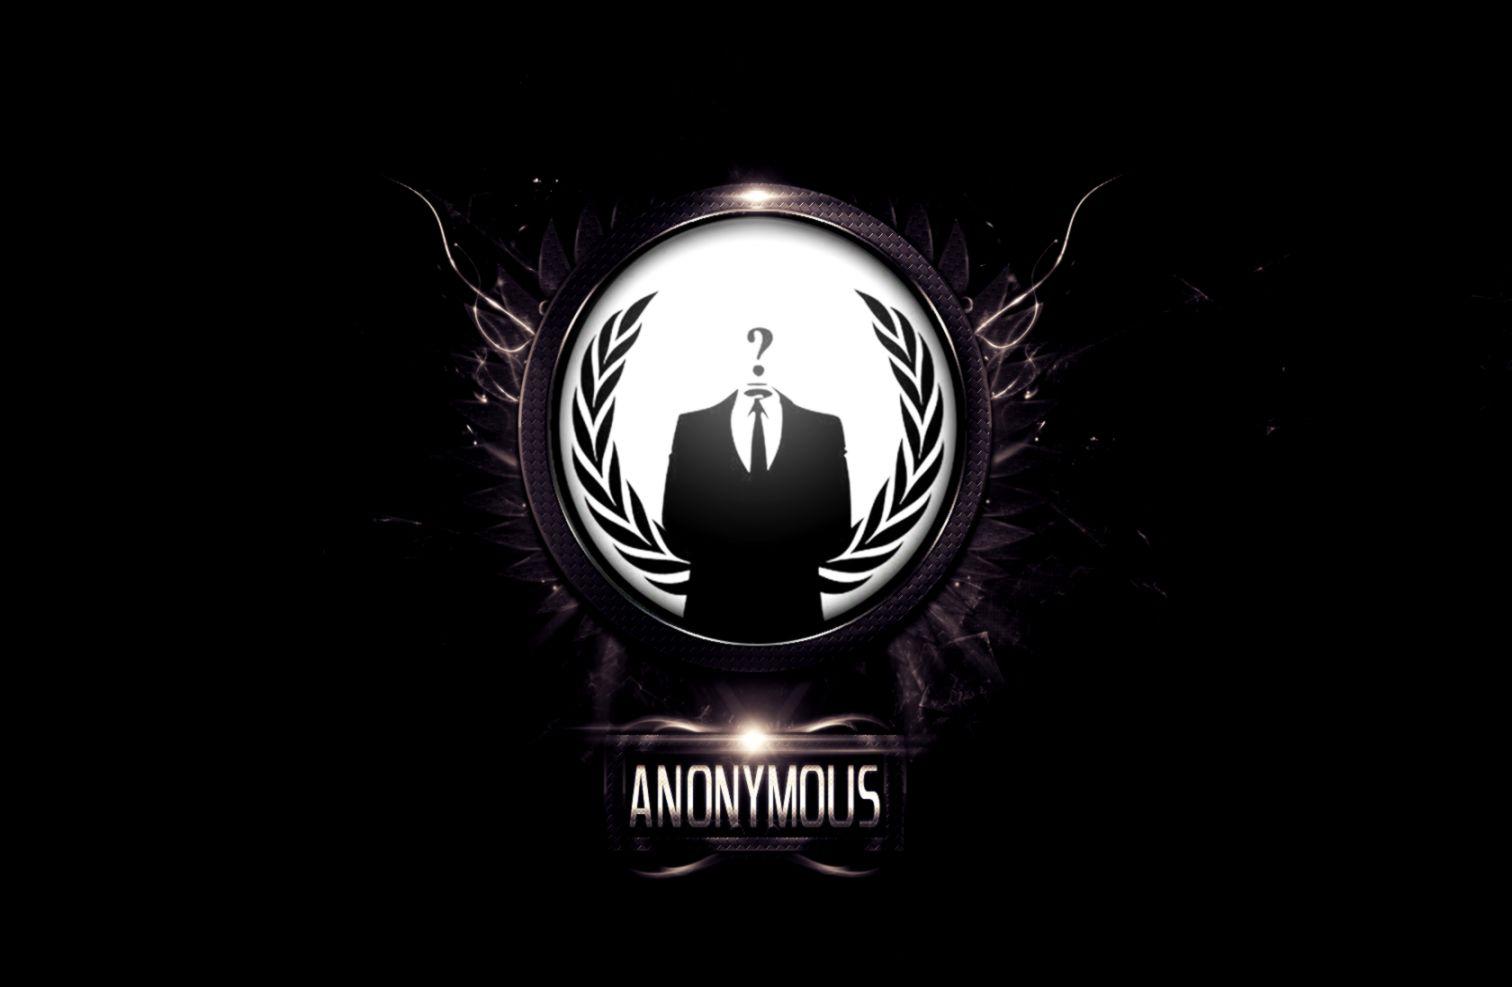 Wallpaper hd anonymous desktop mega wallpapers - Anonymous wallpaper full hd ...